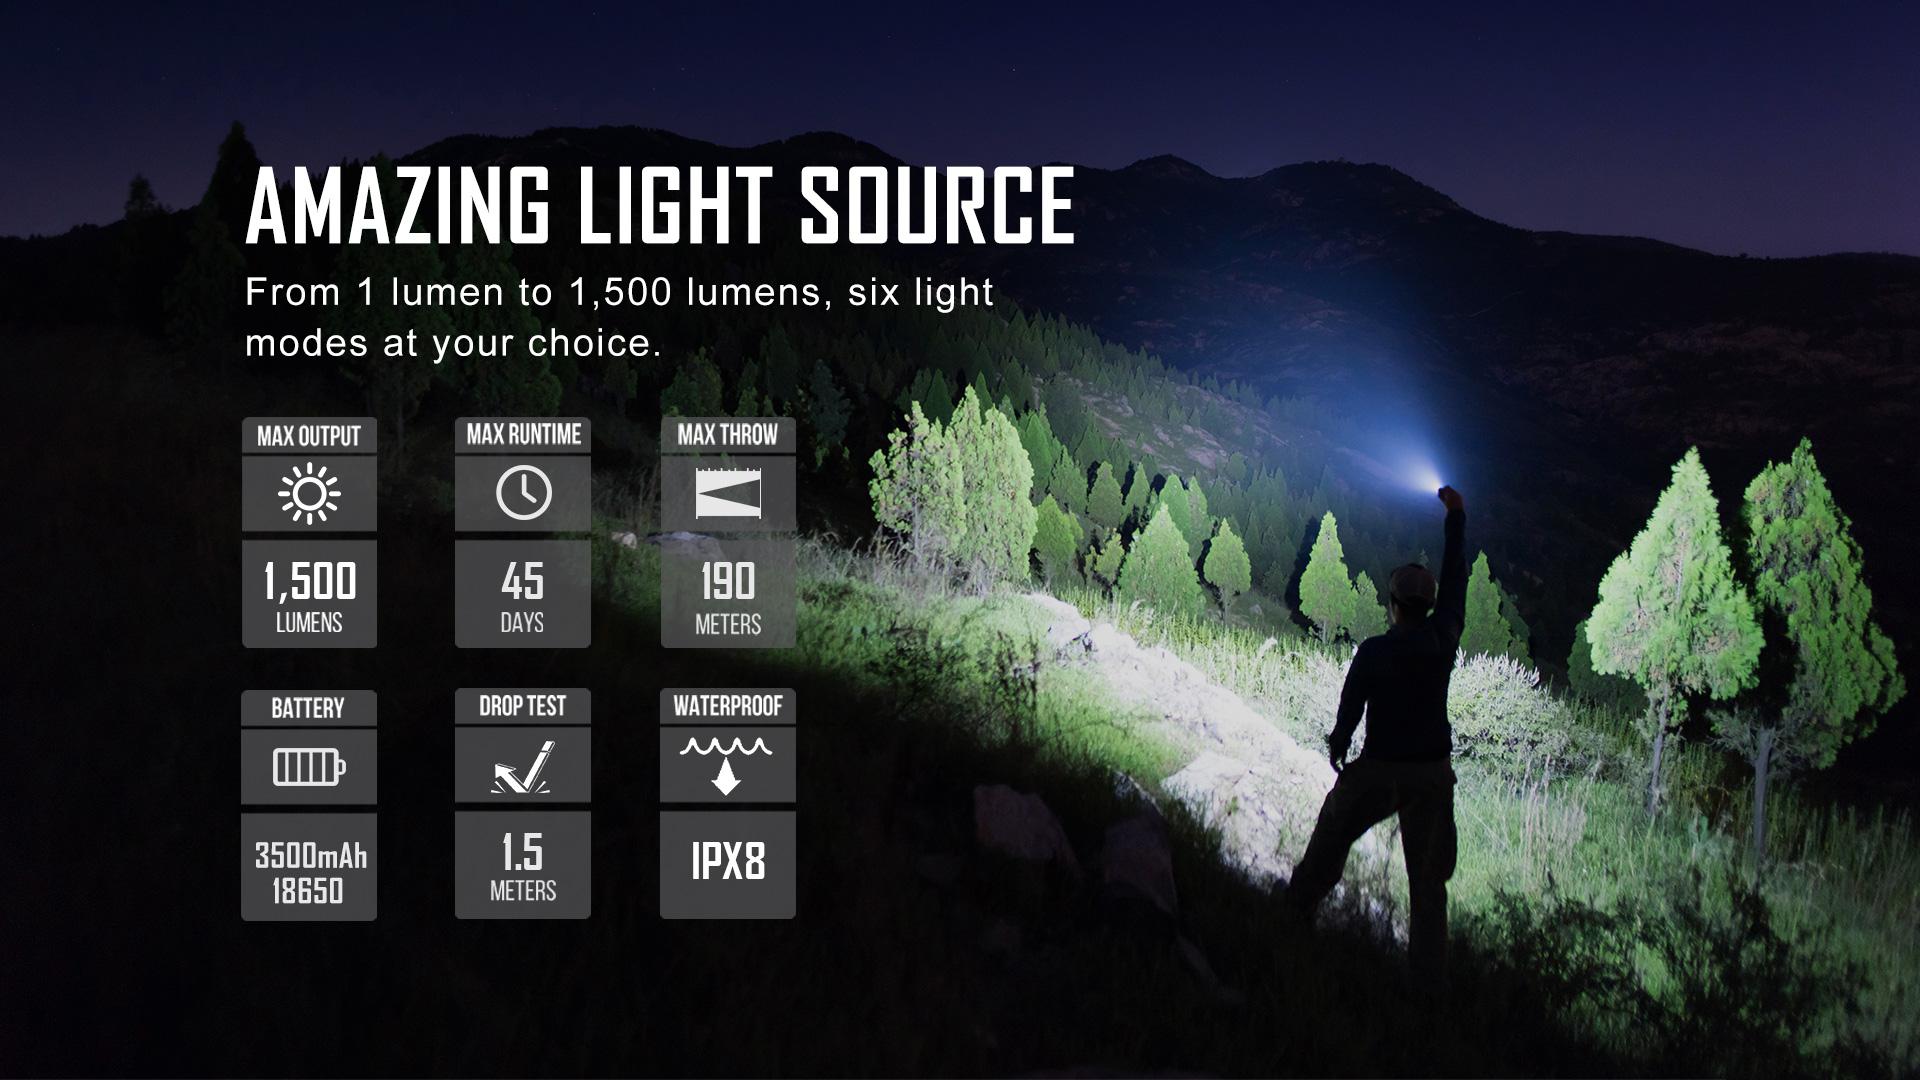 Warrior Mini 1500 lumens &  6 light modes